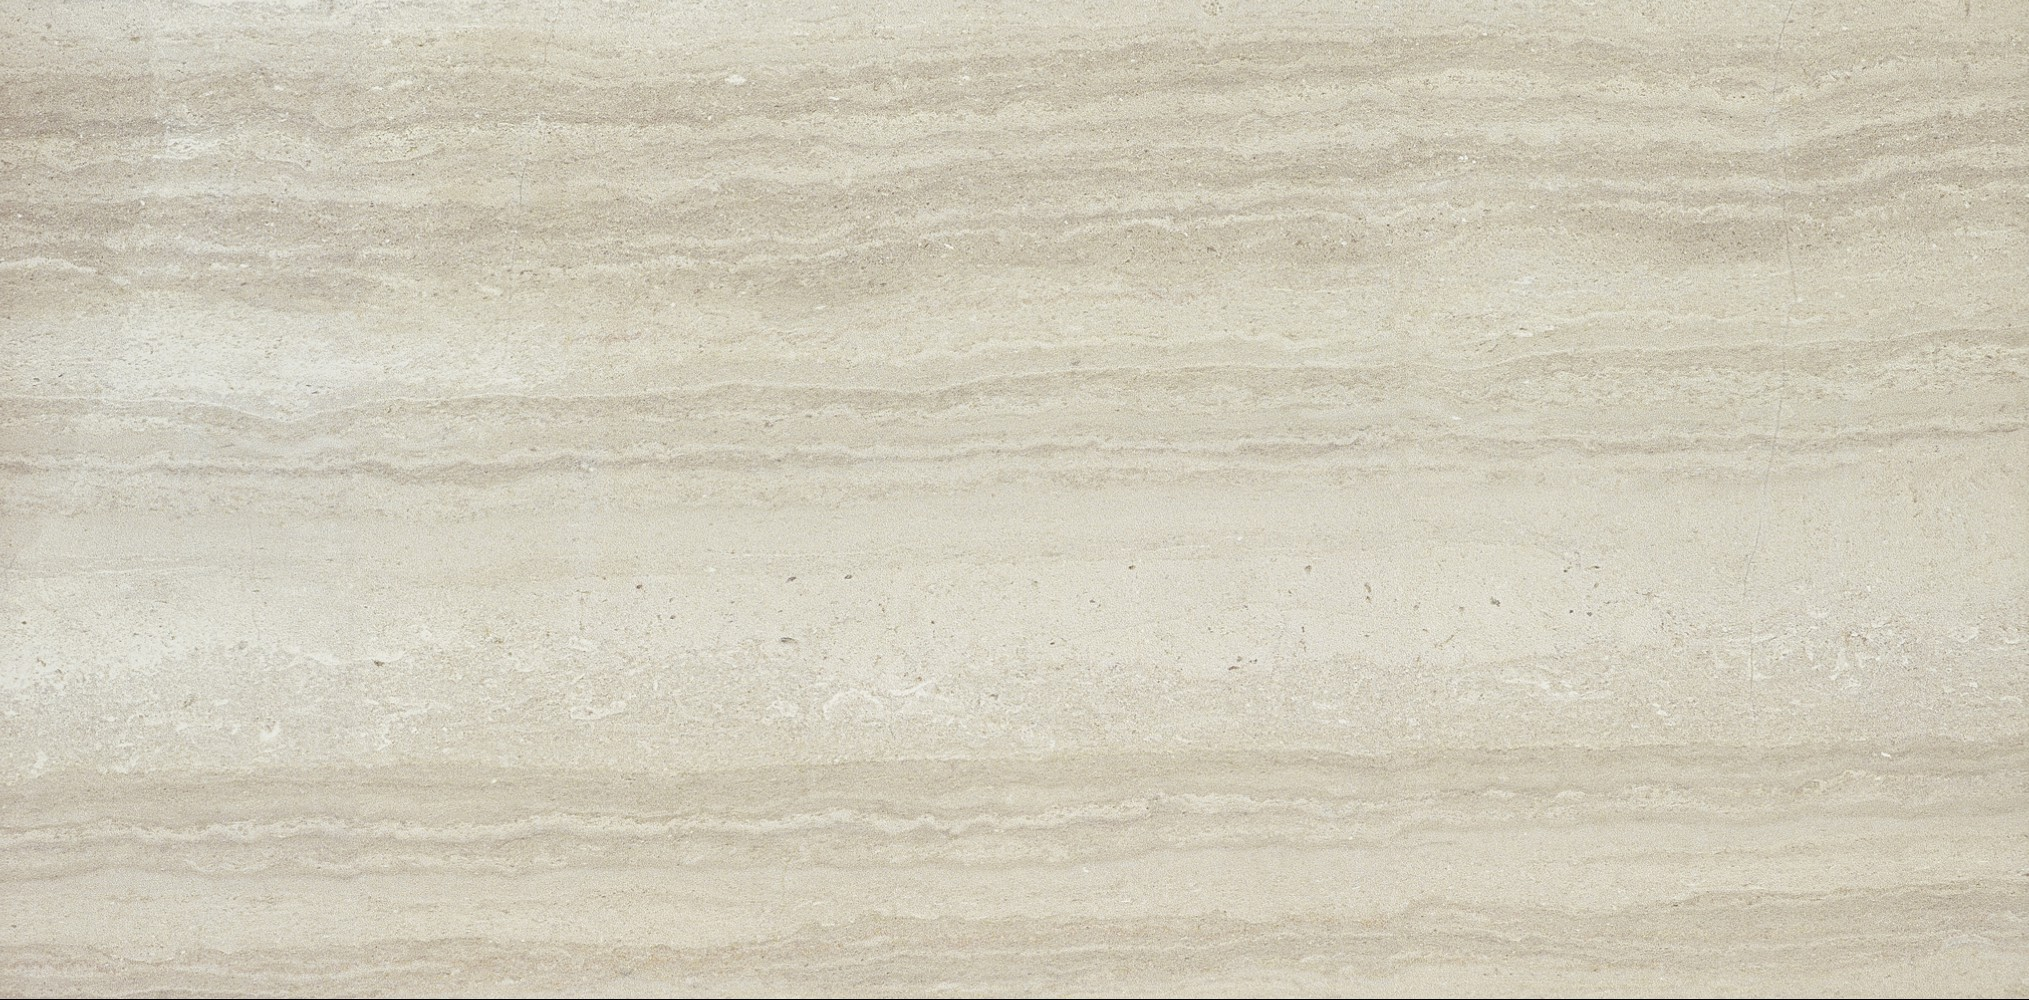 Marmores Travertino 30x60 rectifié